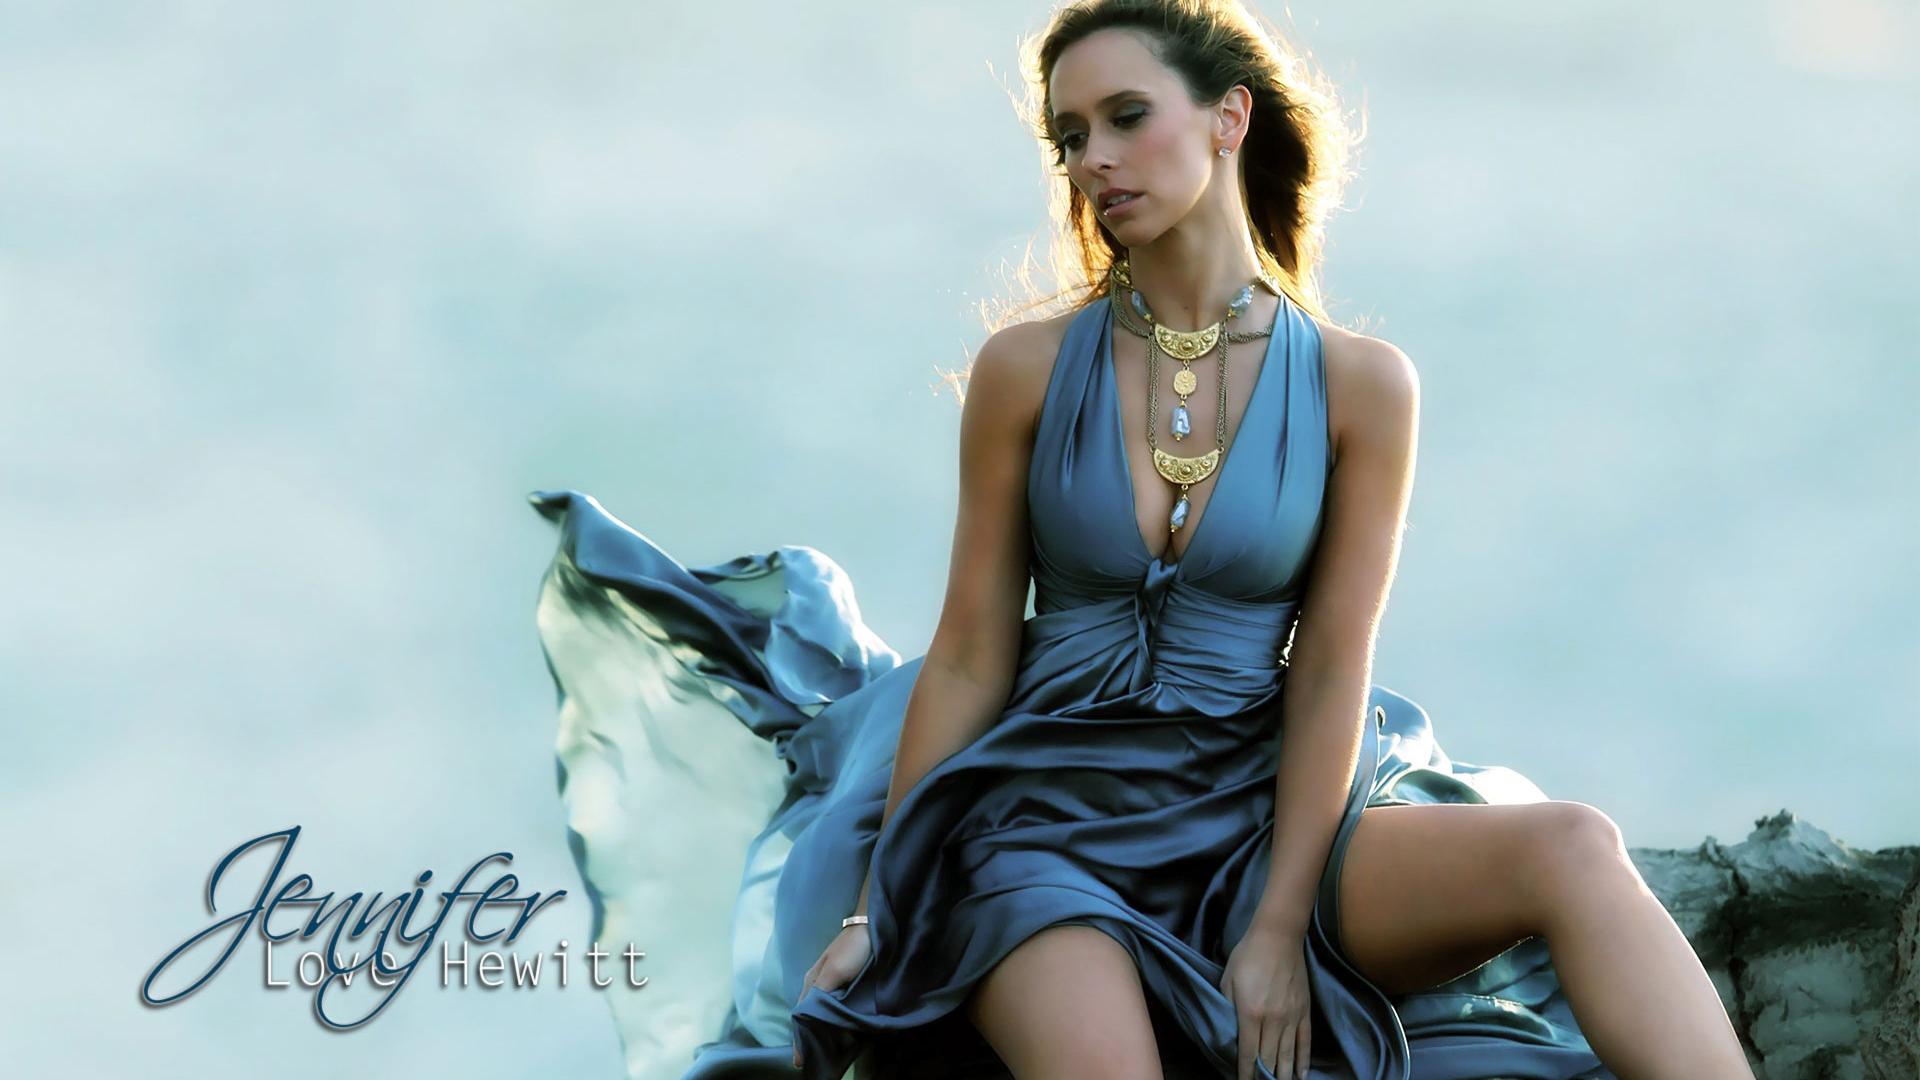 Jennifer Love Hewitt Wallpaper Hd